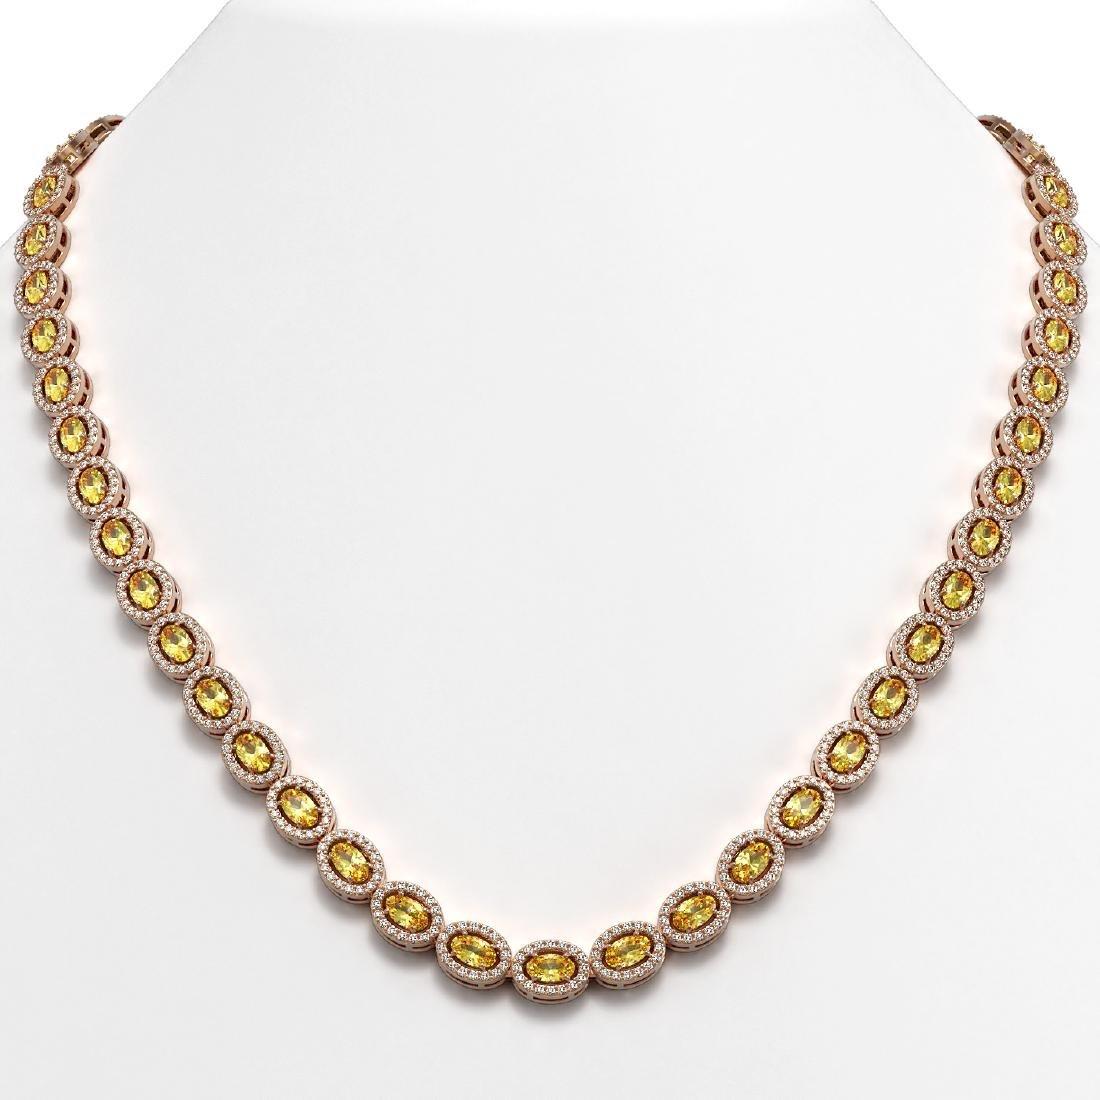 20.16 CTW Fancy Citrine & Diamond Halo Necklace 10K